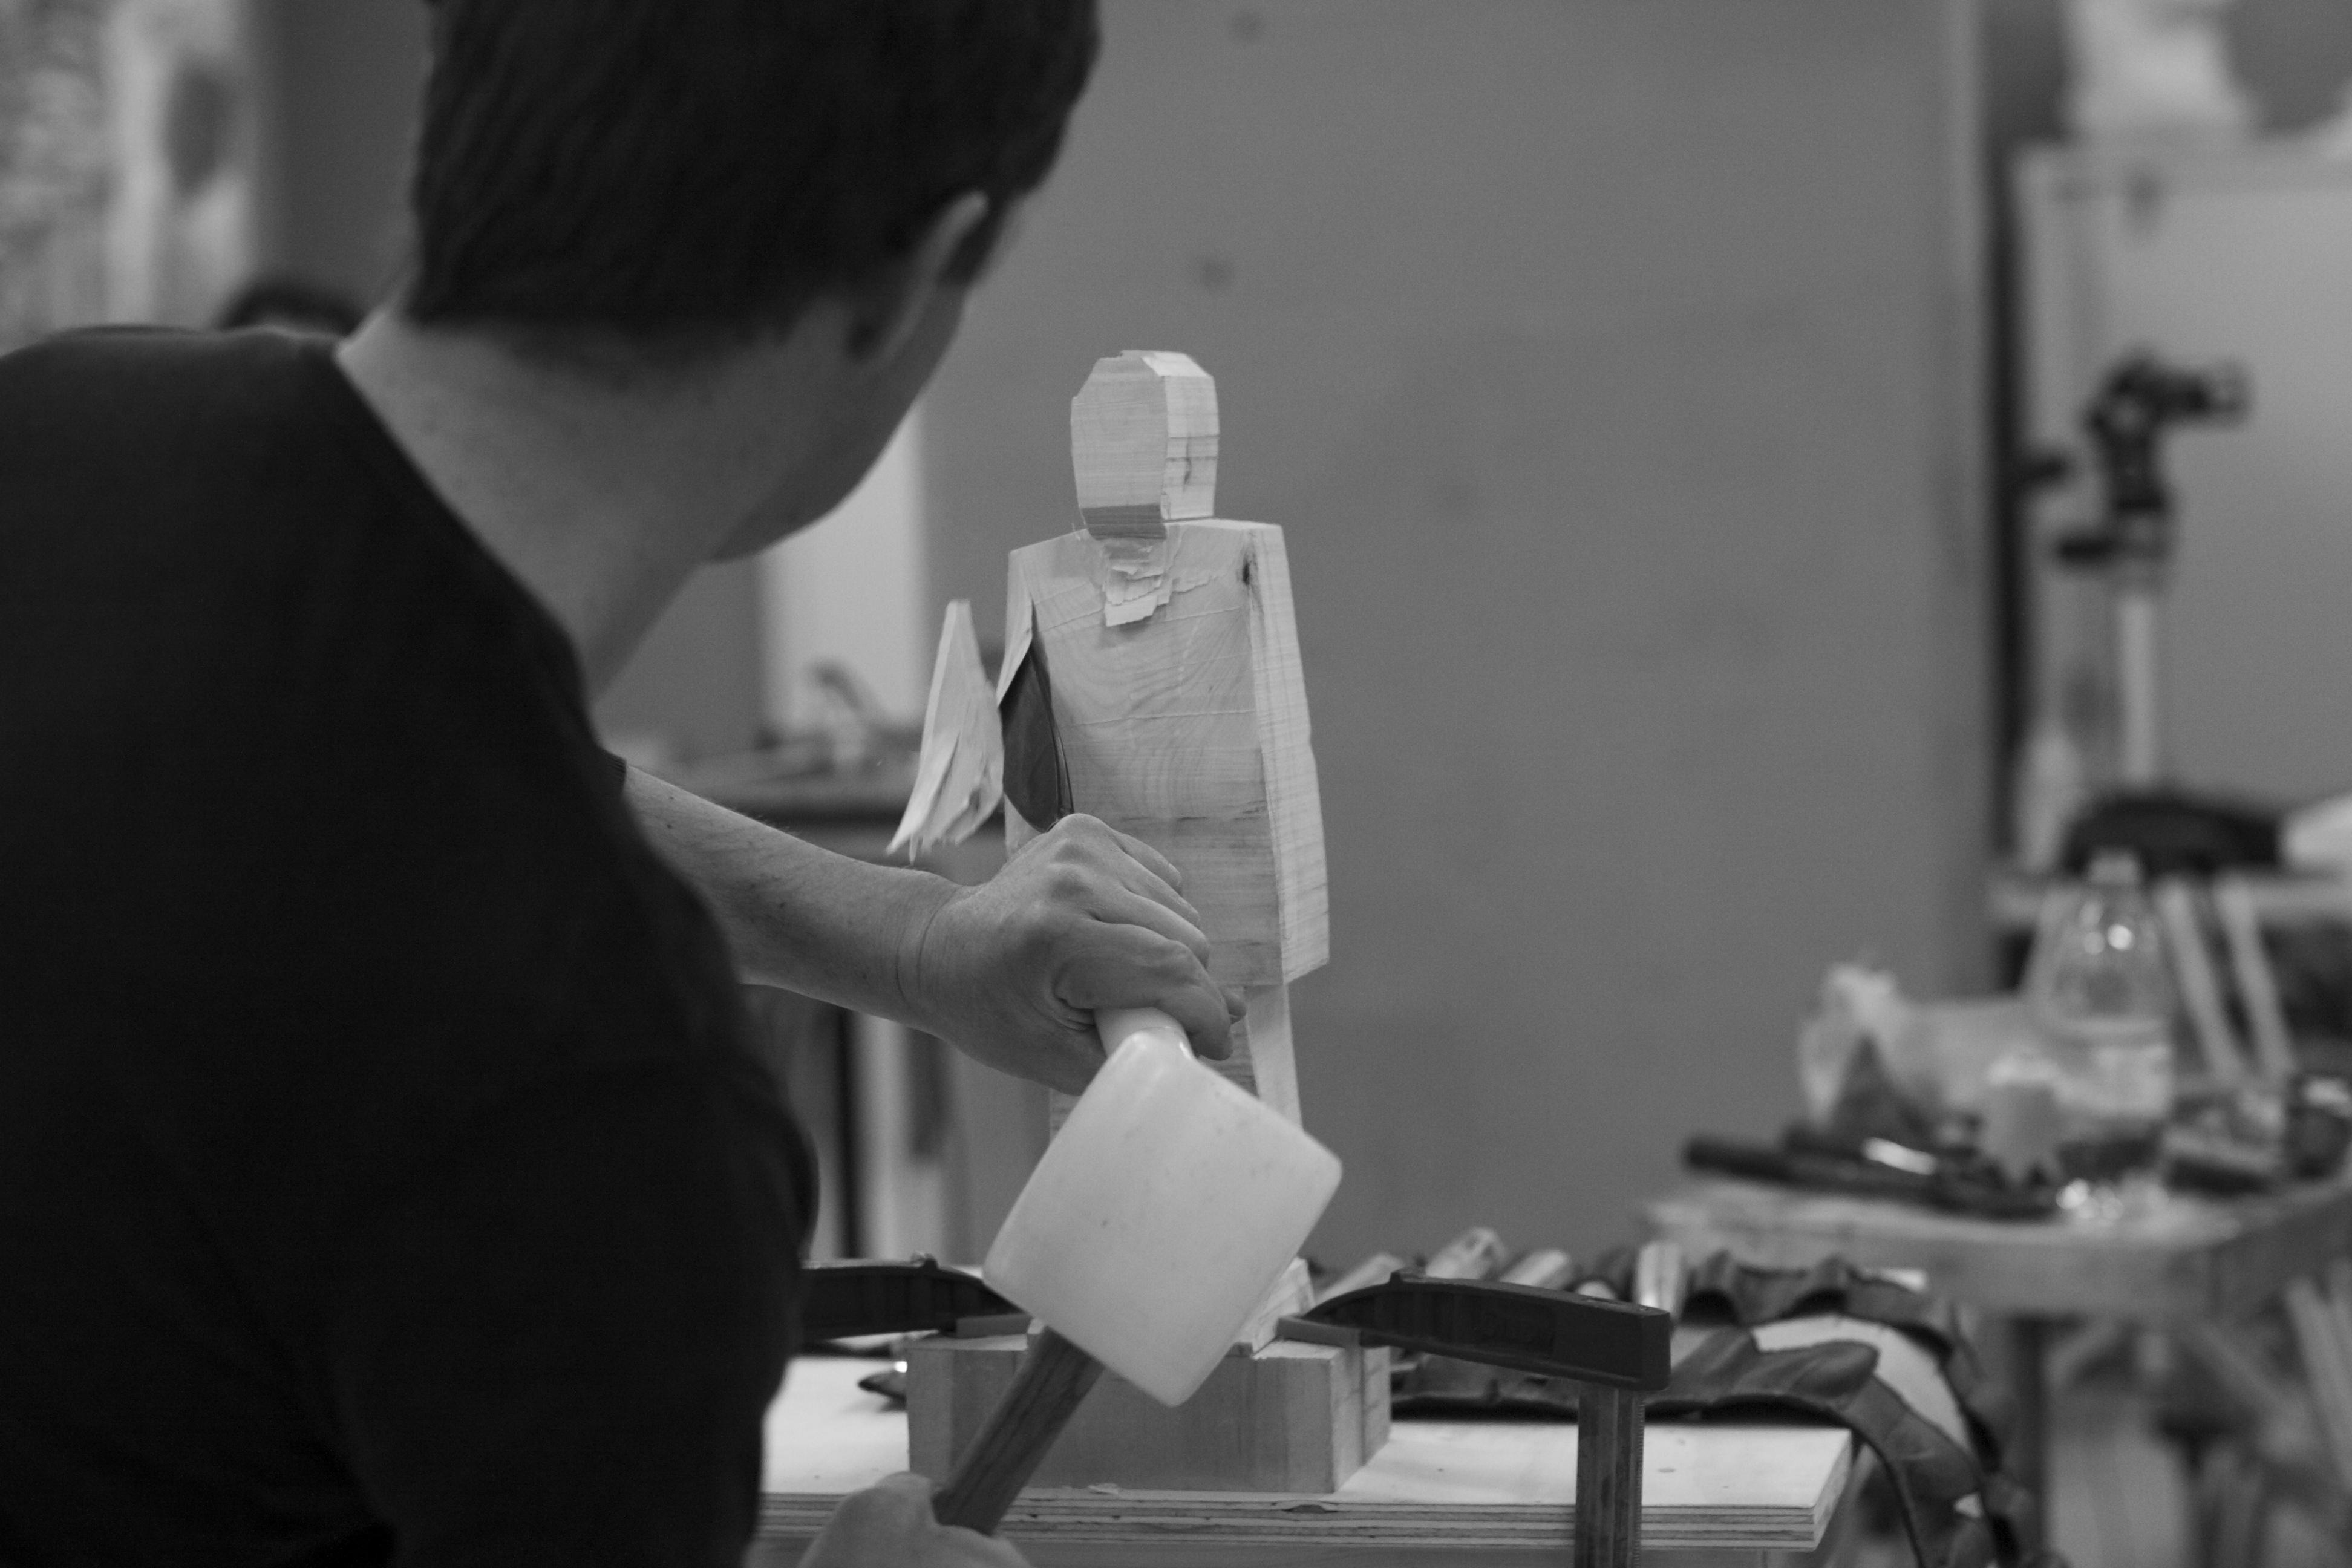 Flickr - Aron Demetz - Dialoghi e materia - Workshop a cura di Franco Reina56